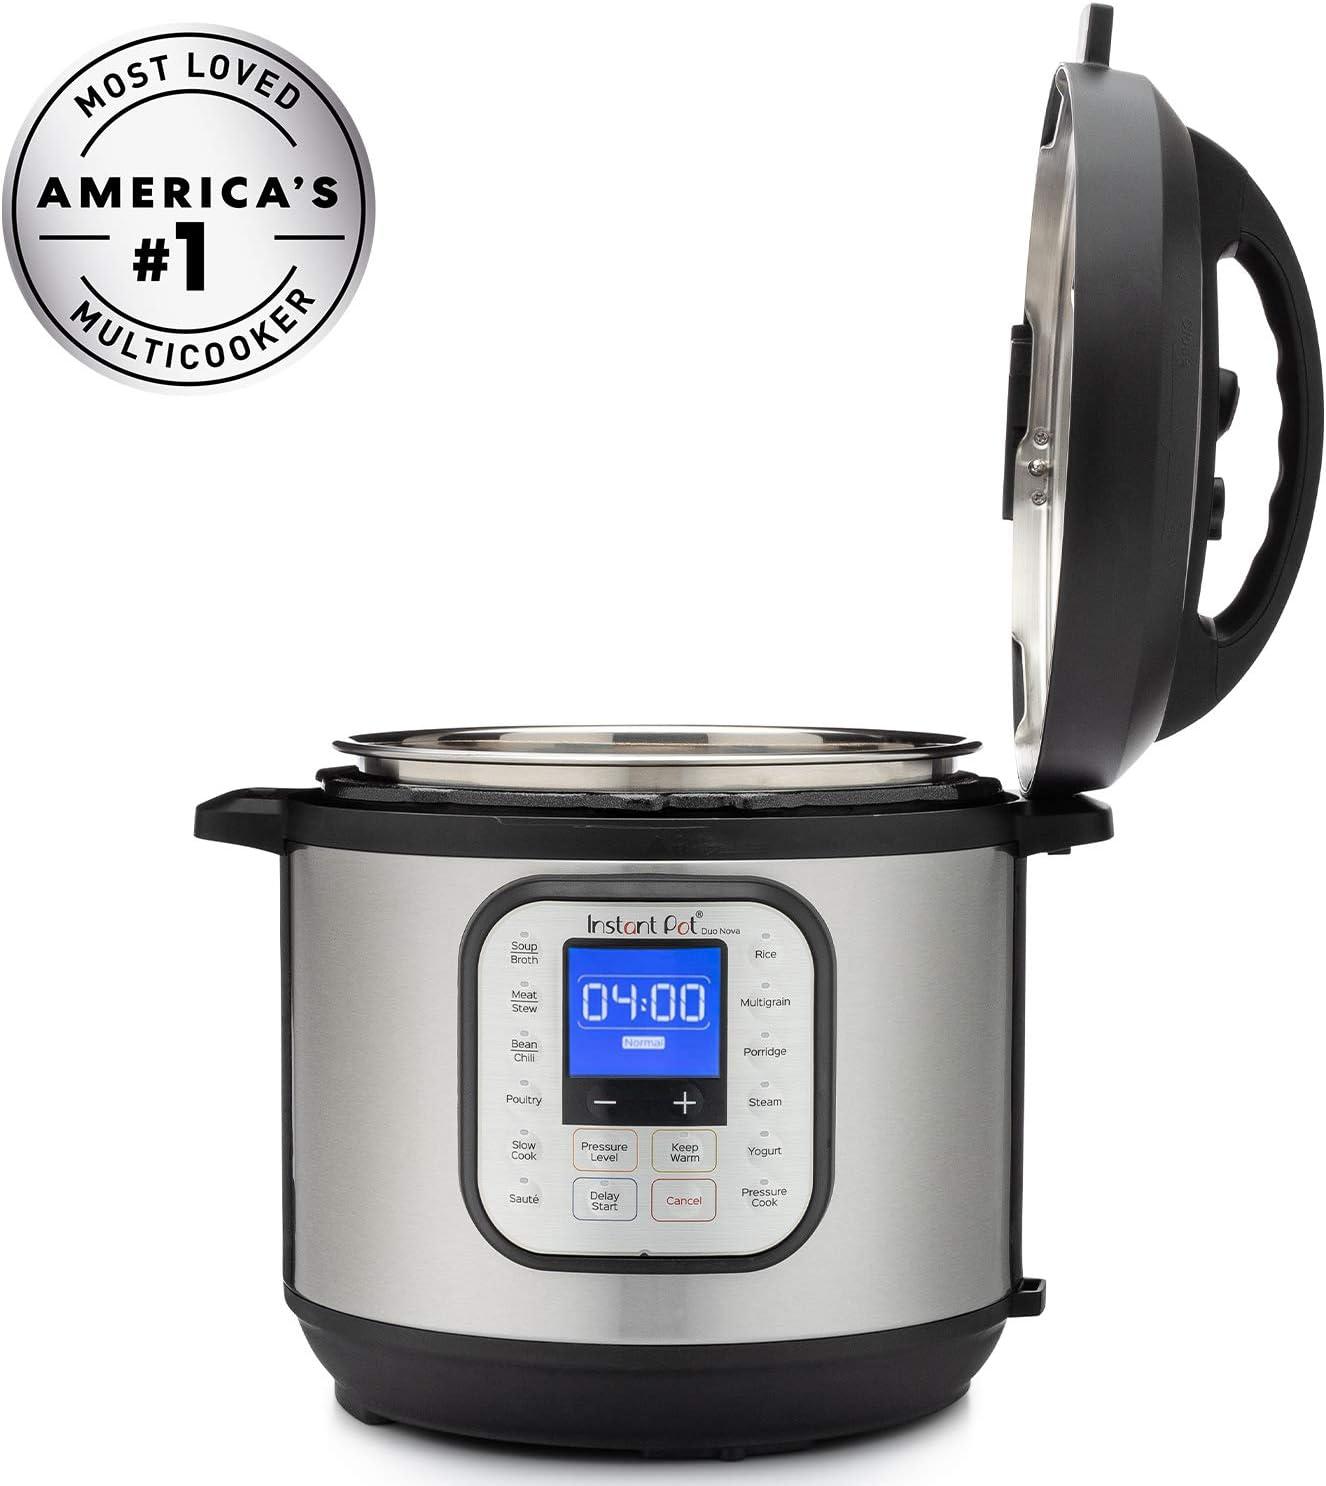 Rice cooker vs slow cooker